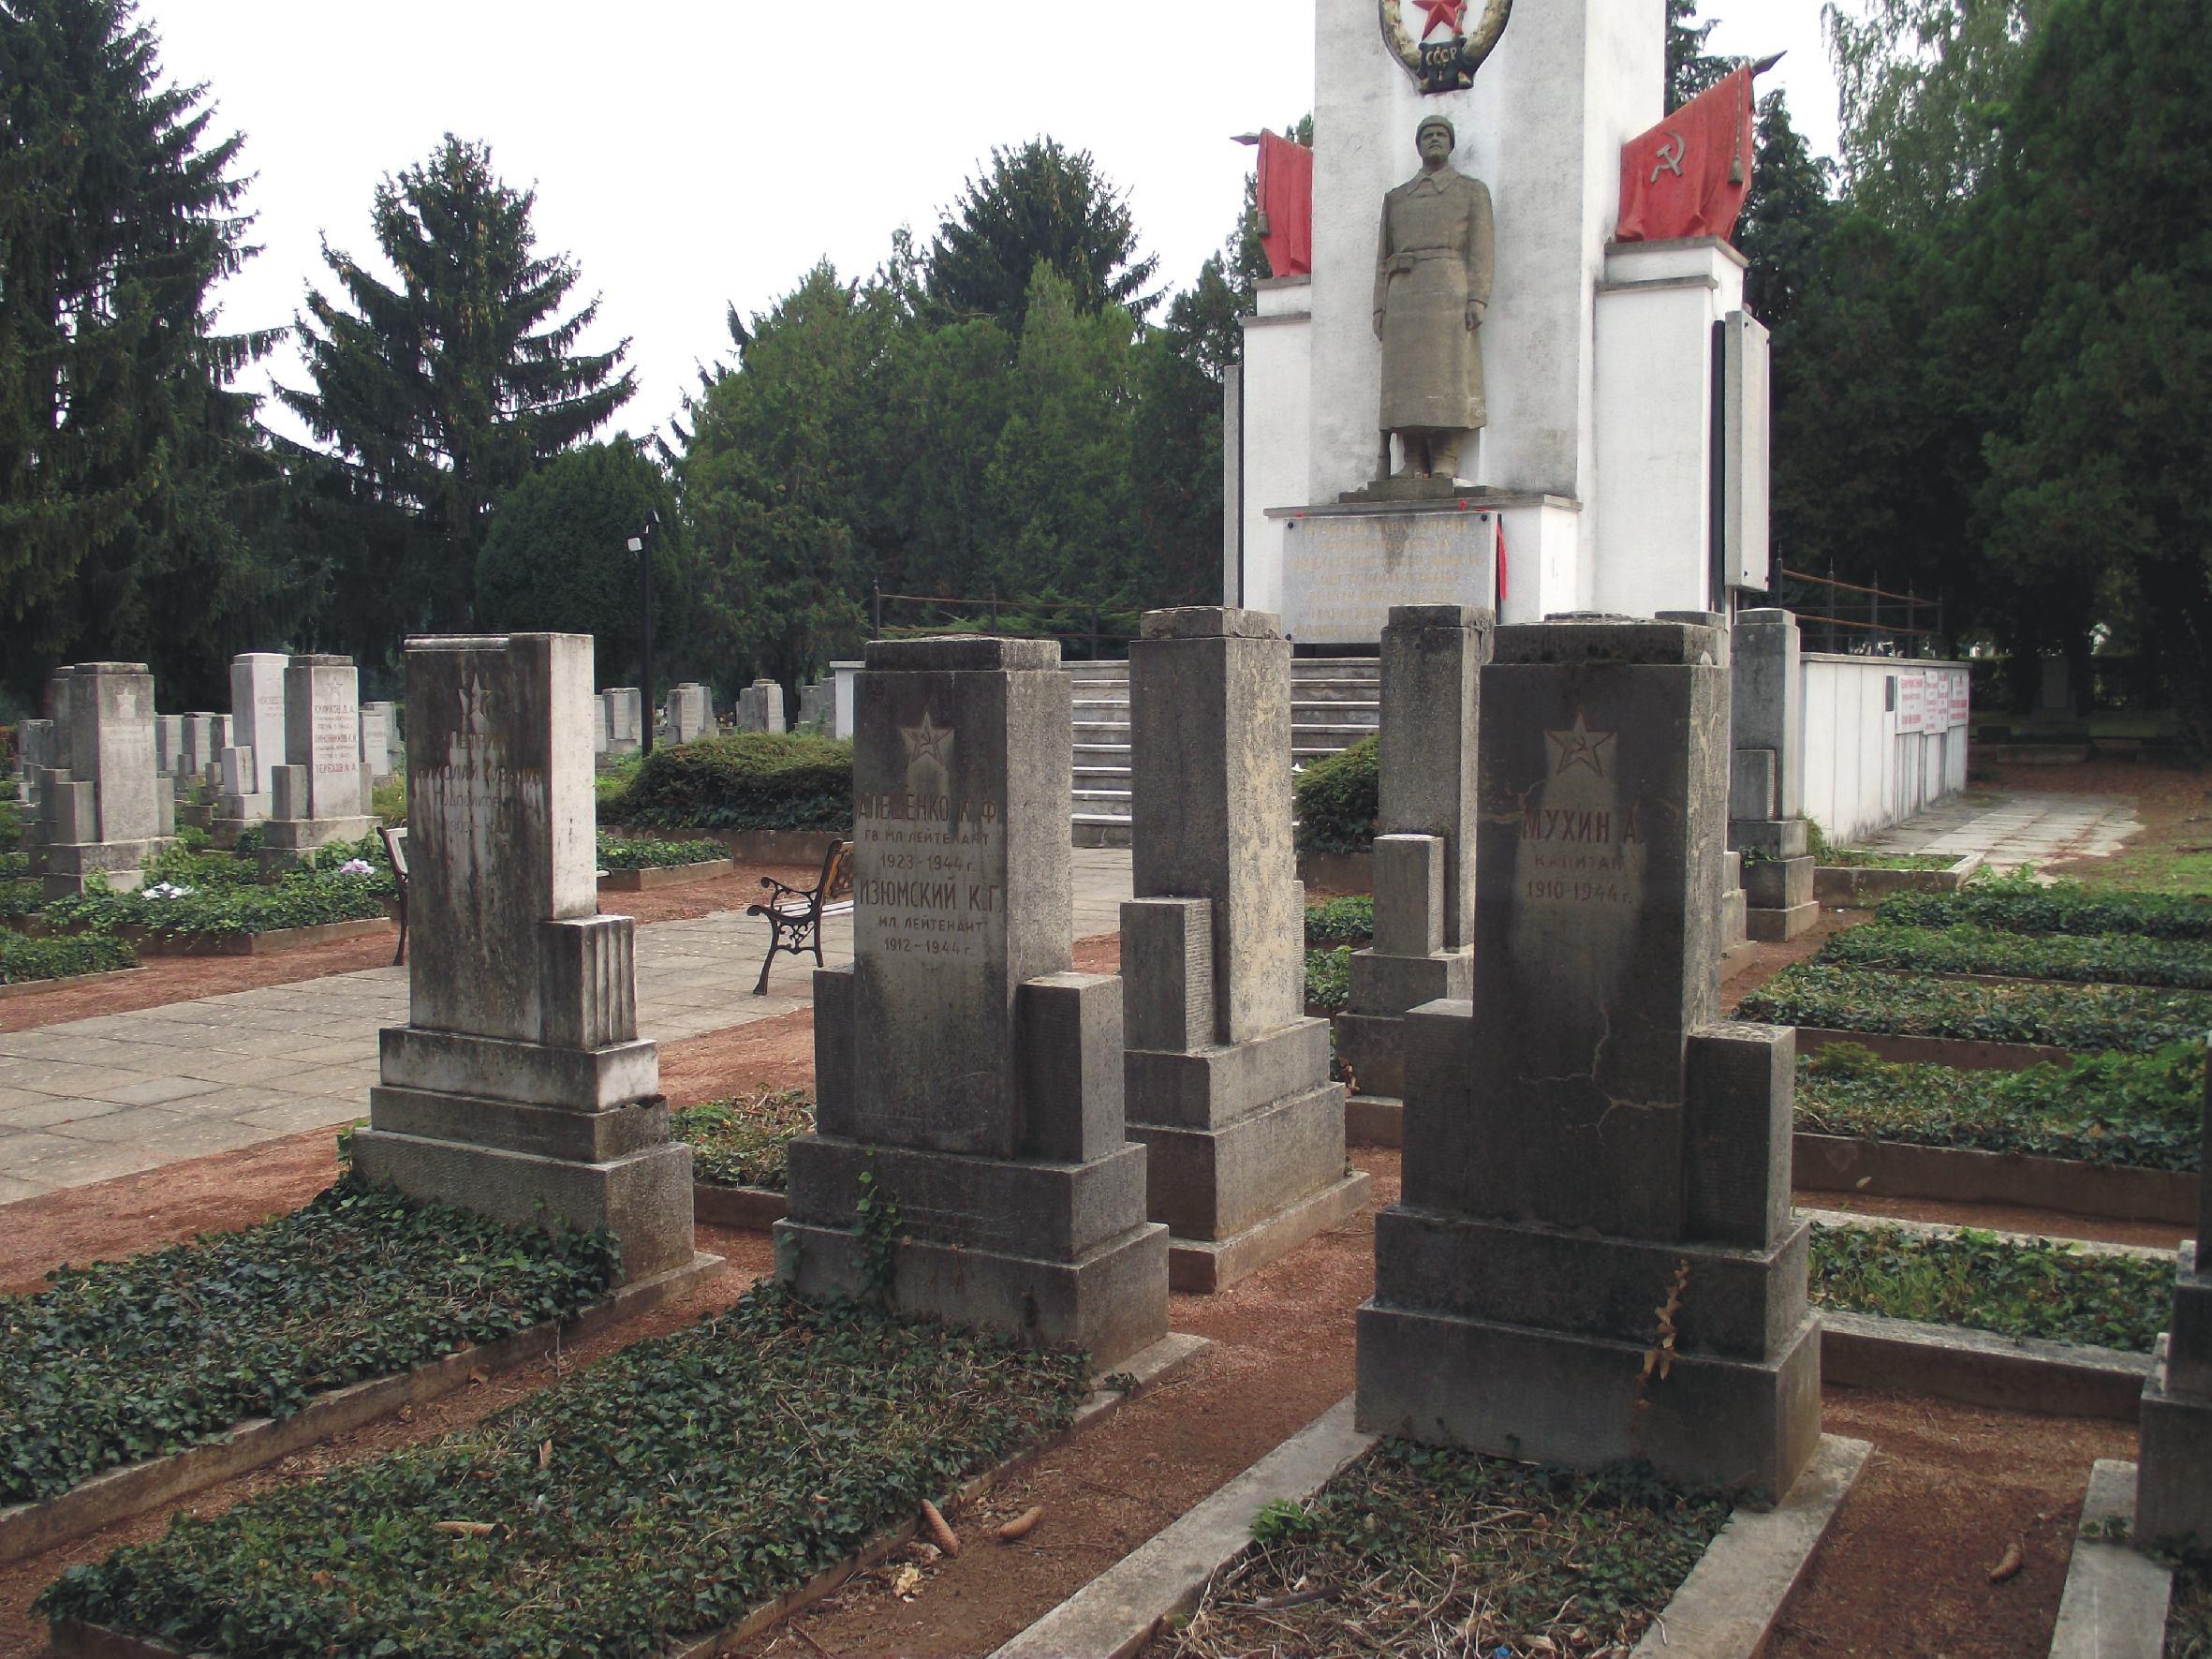 Grave_3.jpg.789e86e30ba917ea62e87113b6ff9e39.jpg